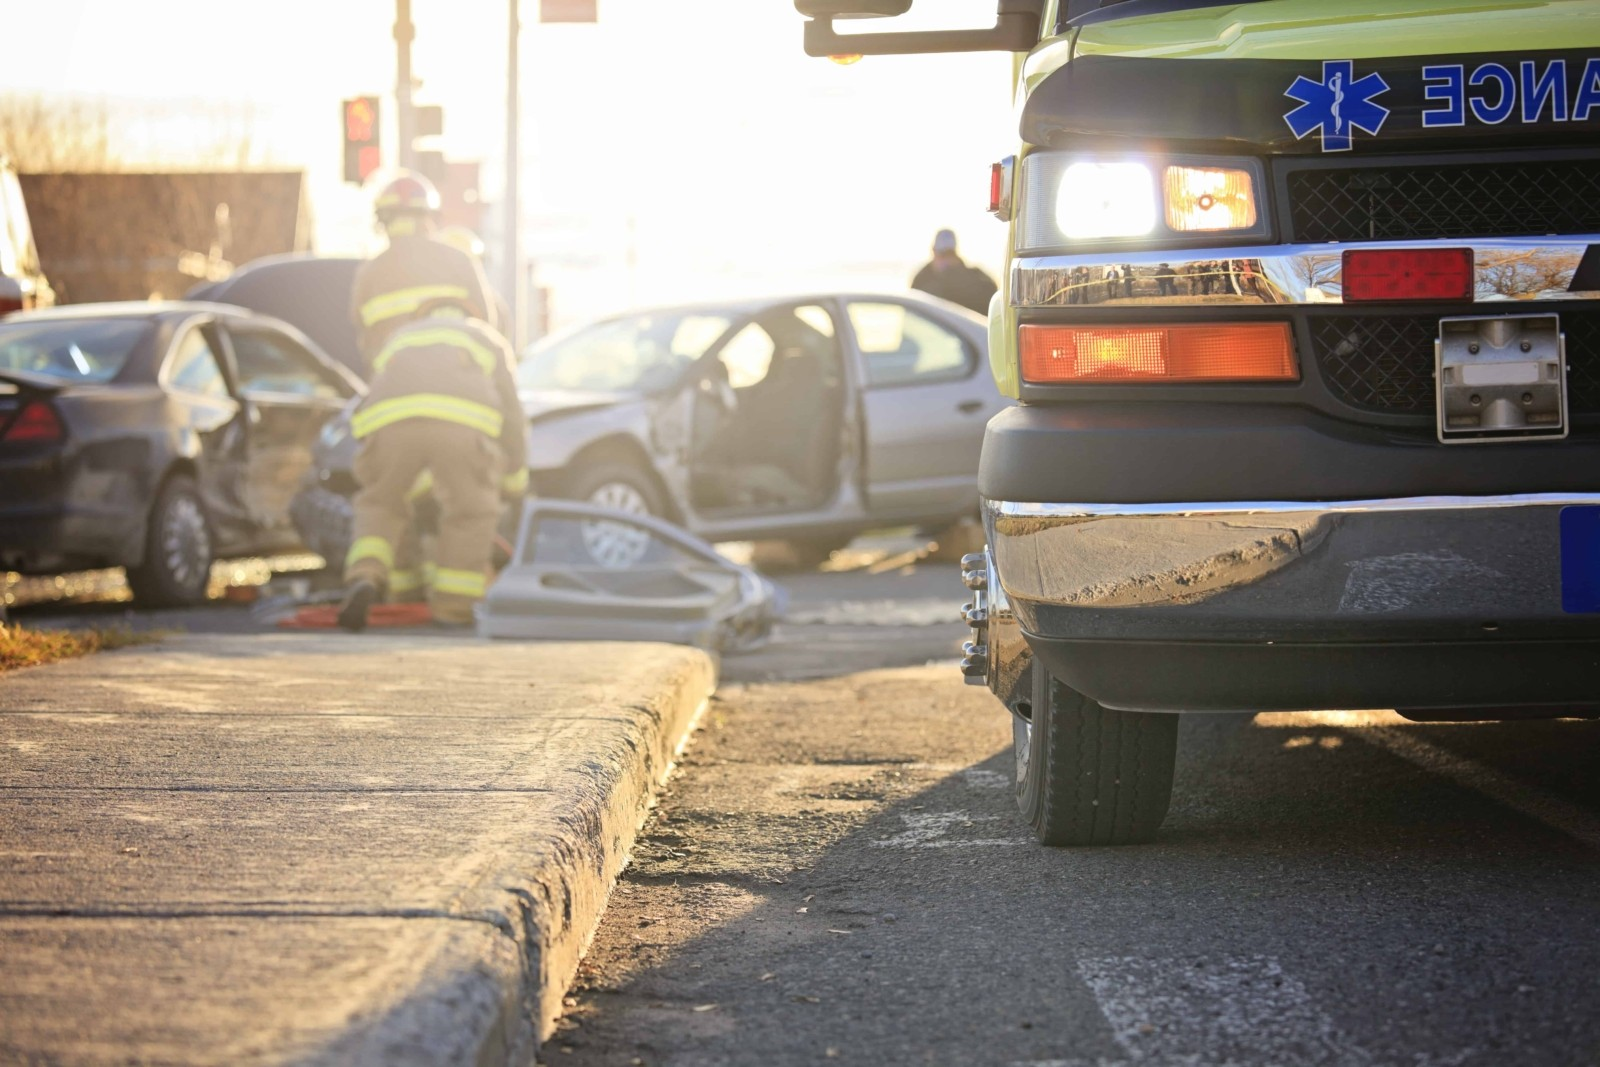 Cheryl Anderson Killed in Two-Vehicle Crash on 44th Avenue [Phoenix, AZ]